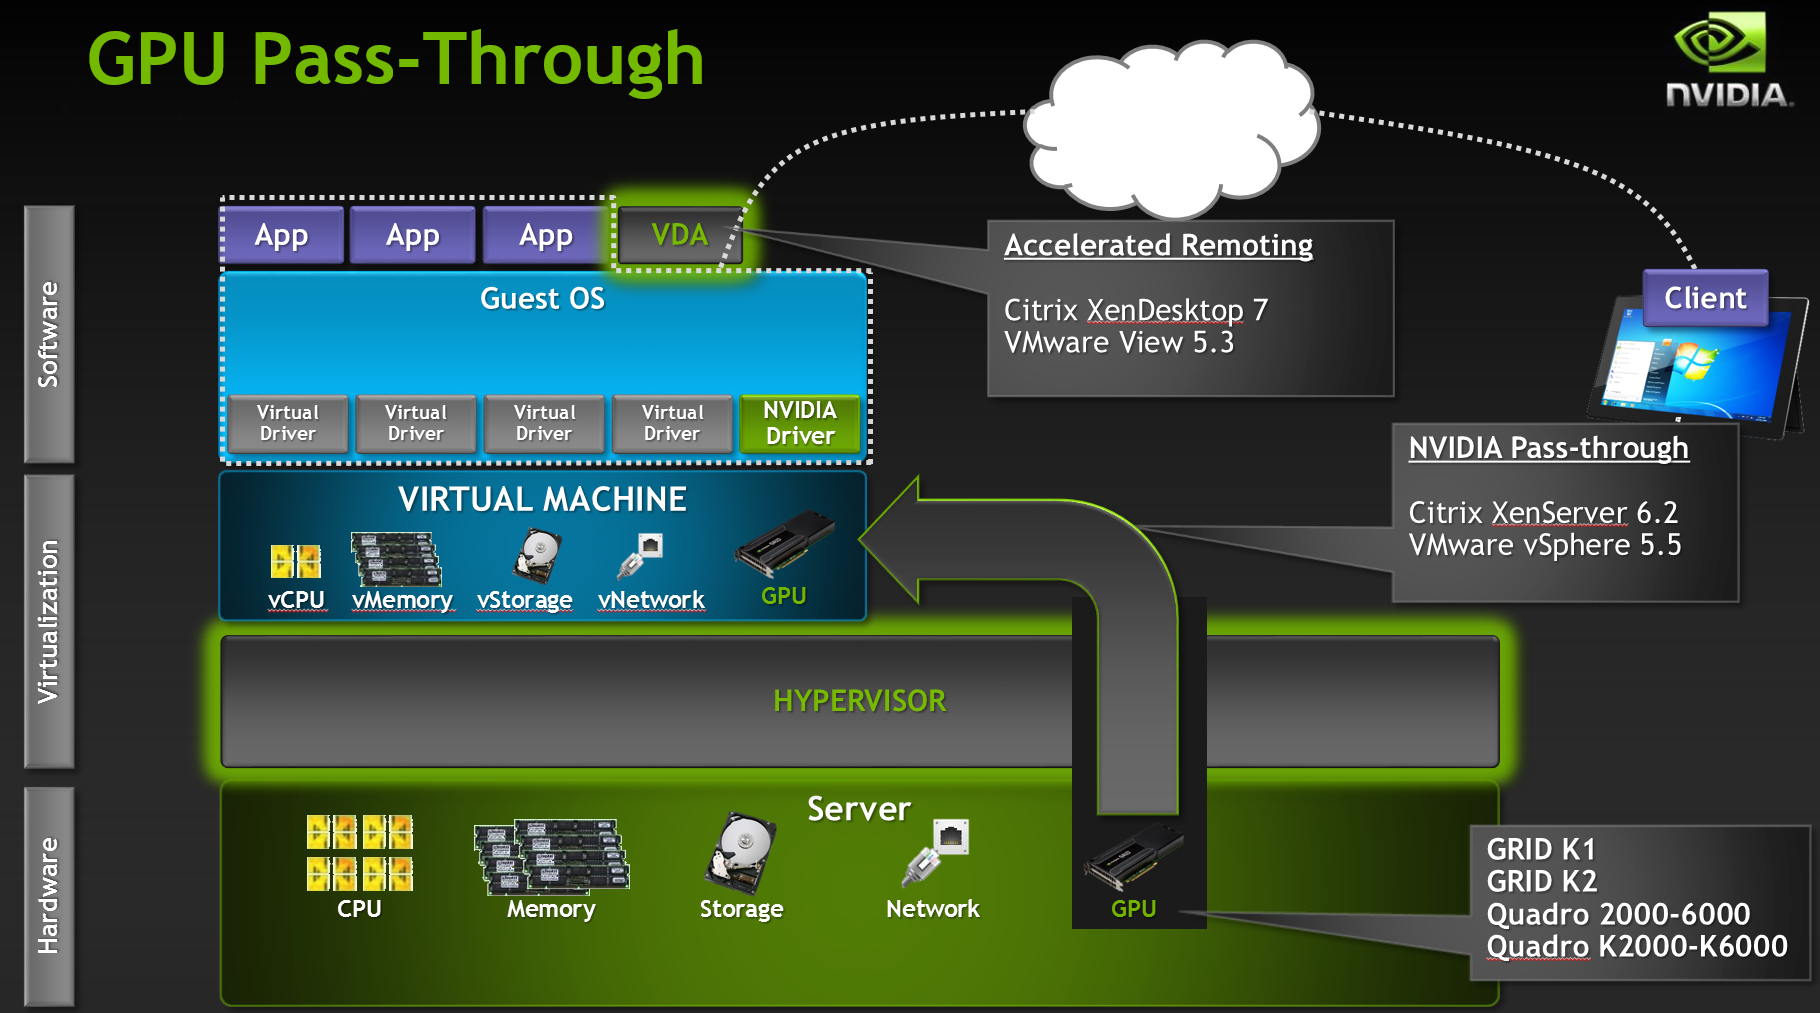 NVIDIA GPU Passthrough GRID